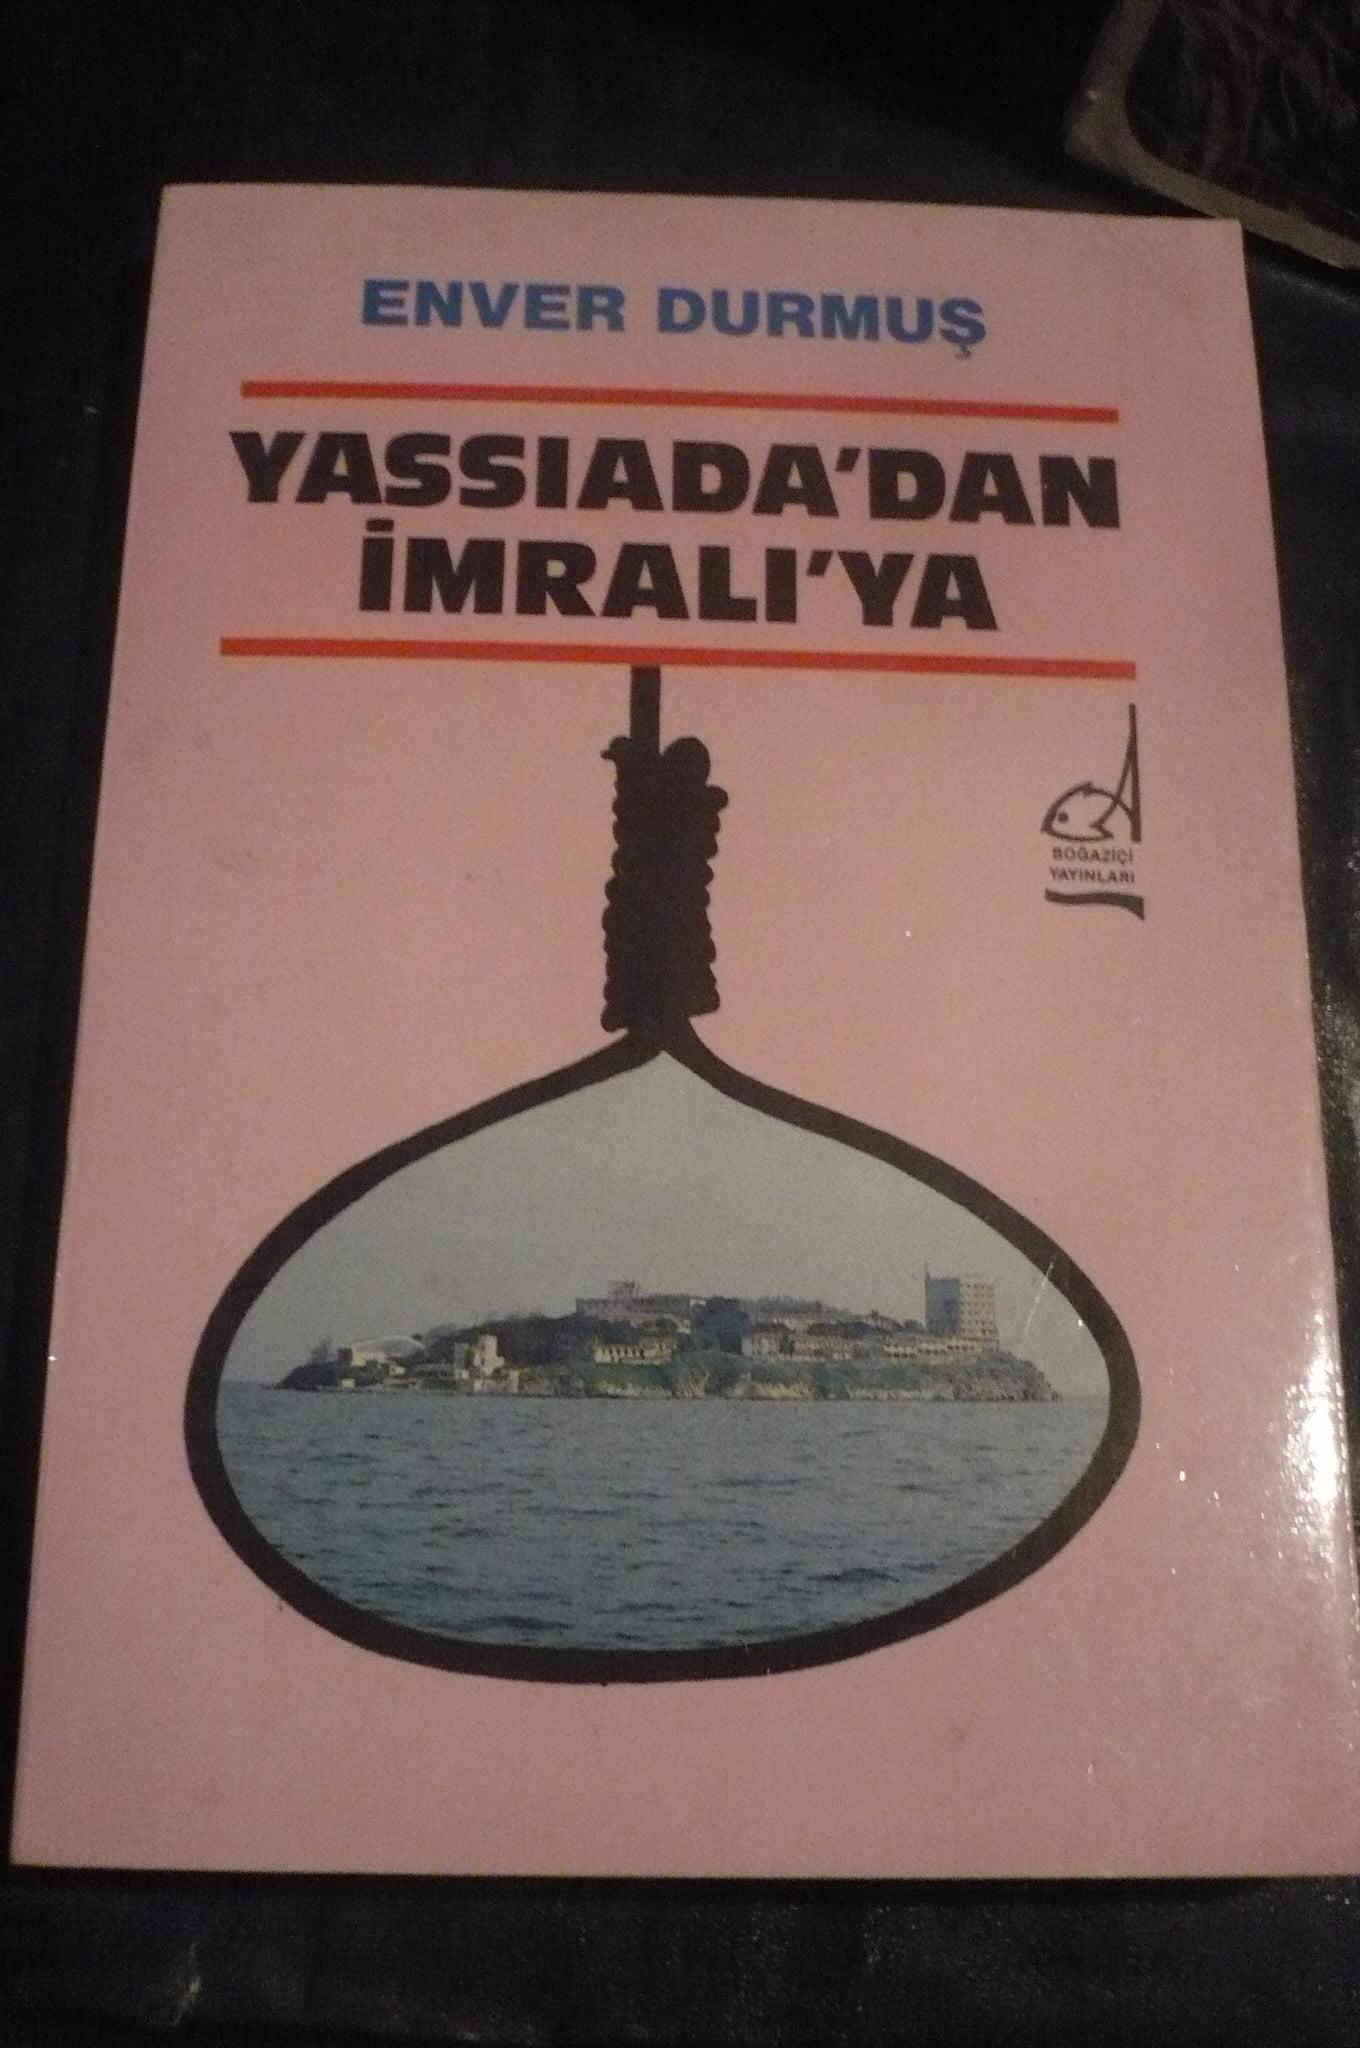 YASSIADA'DAN İMRALI'YA /Enver DURMUŞ/15 TL